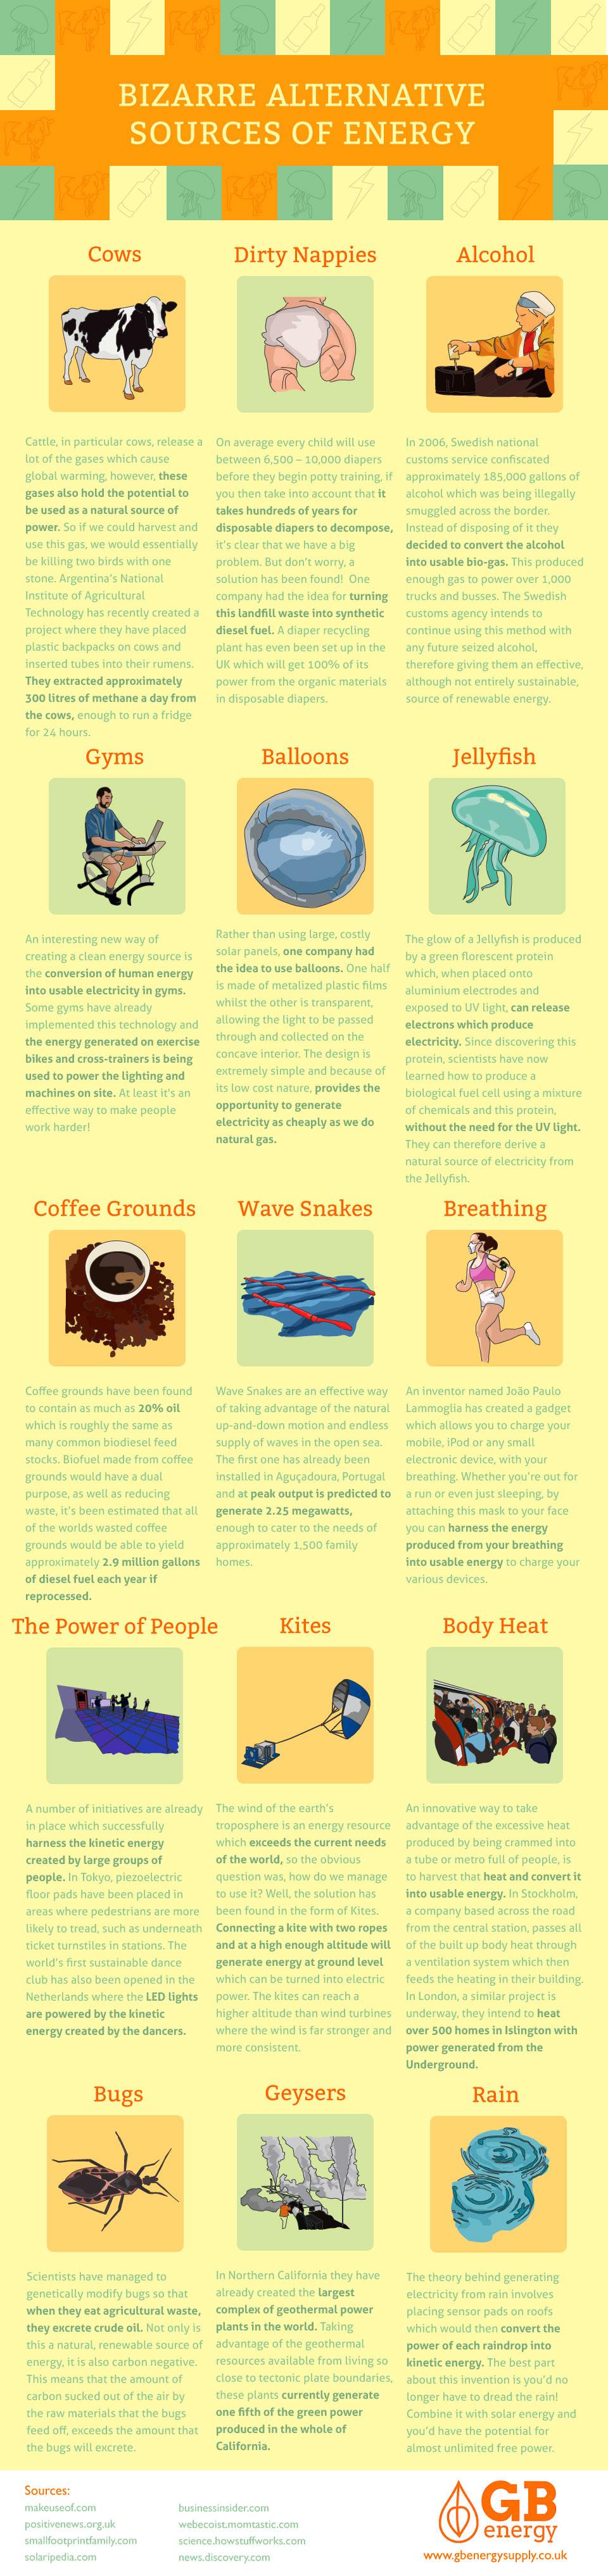 Bizarre Alternative Sources of Energy